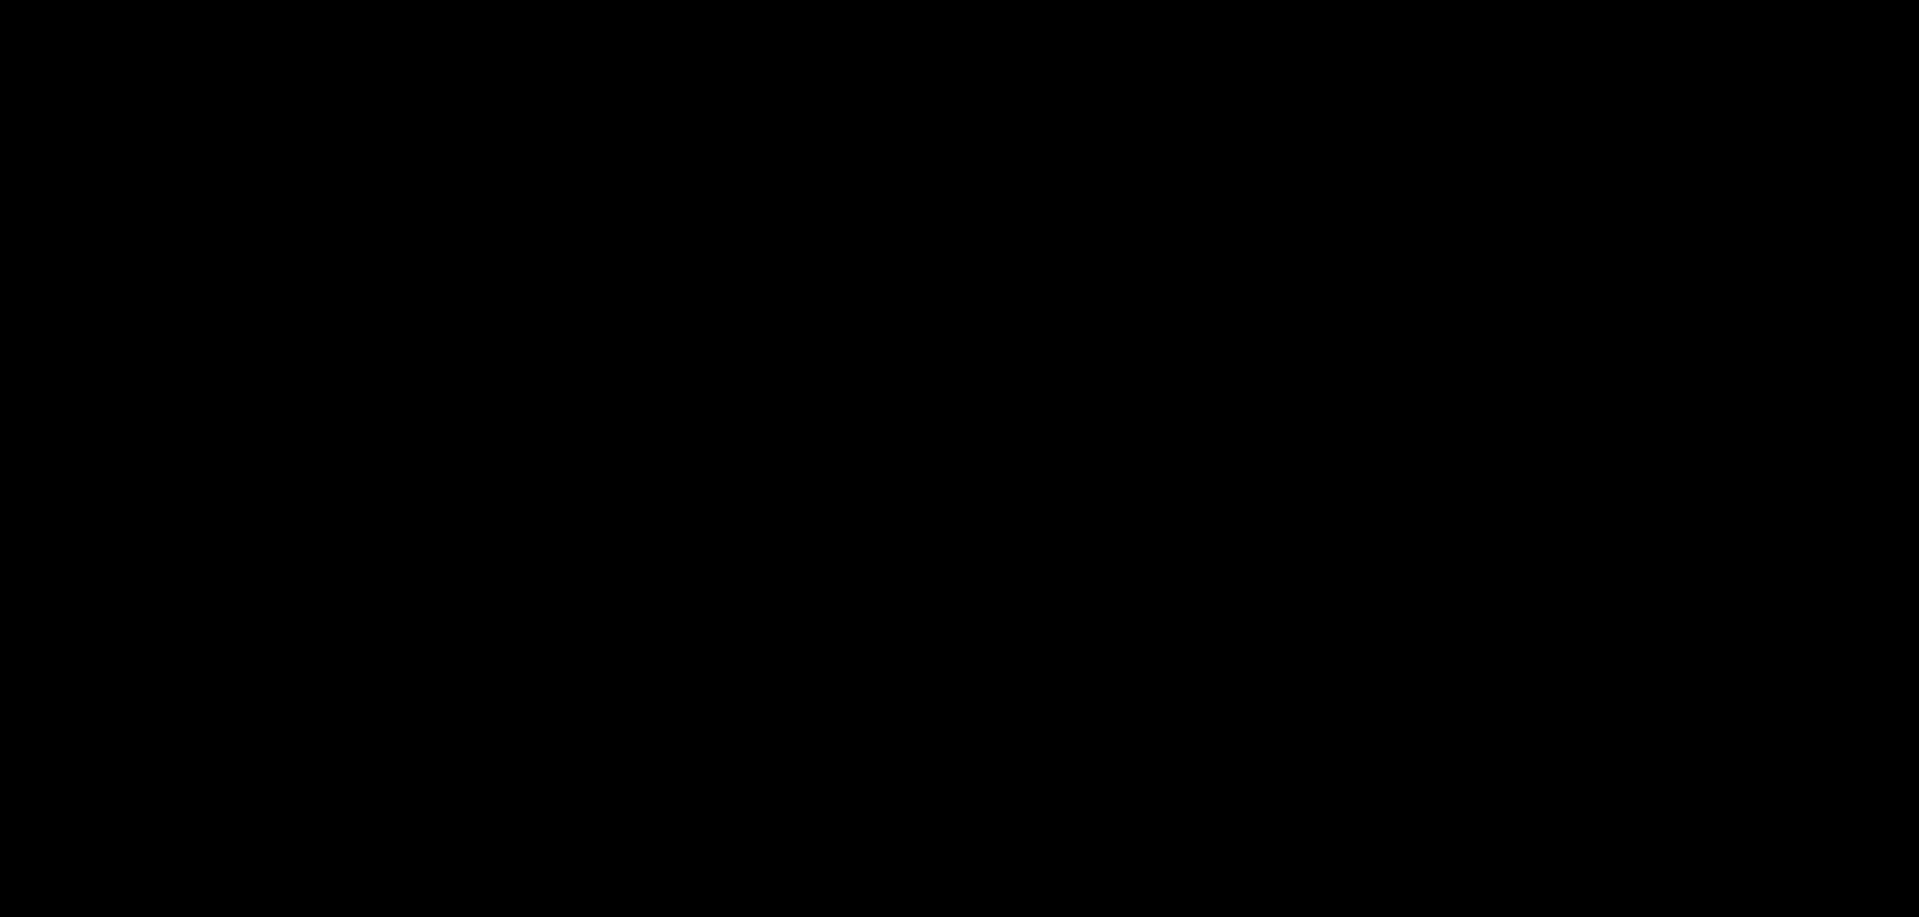 ITscope